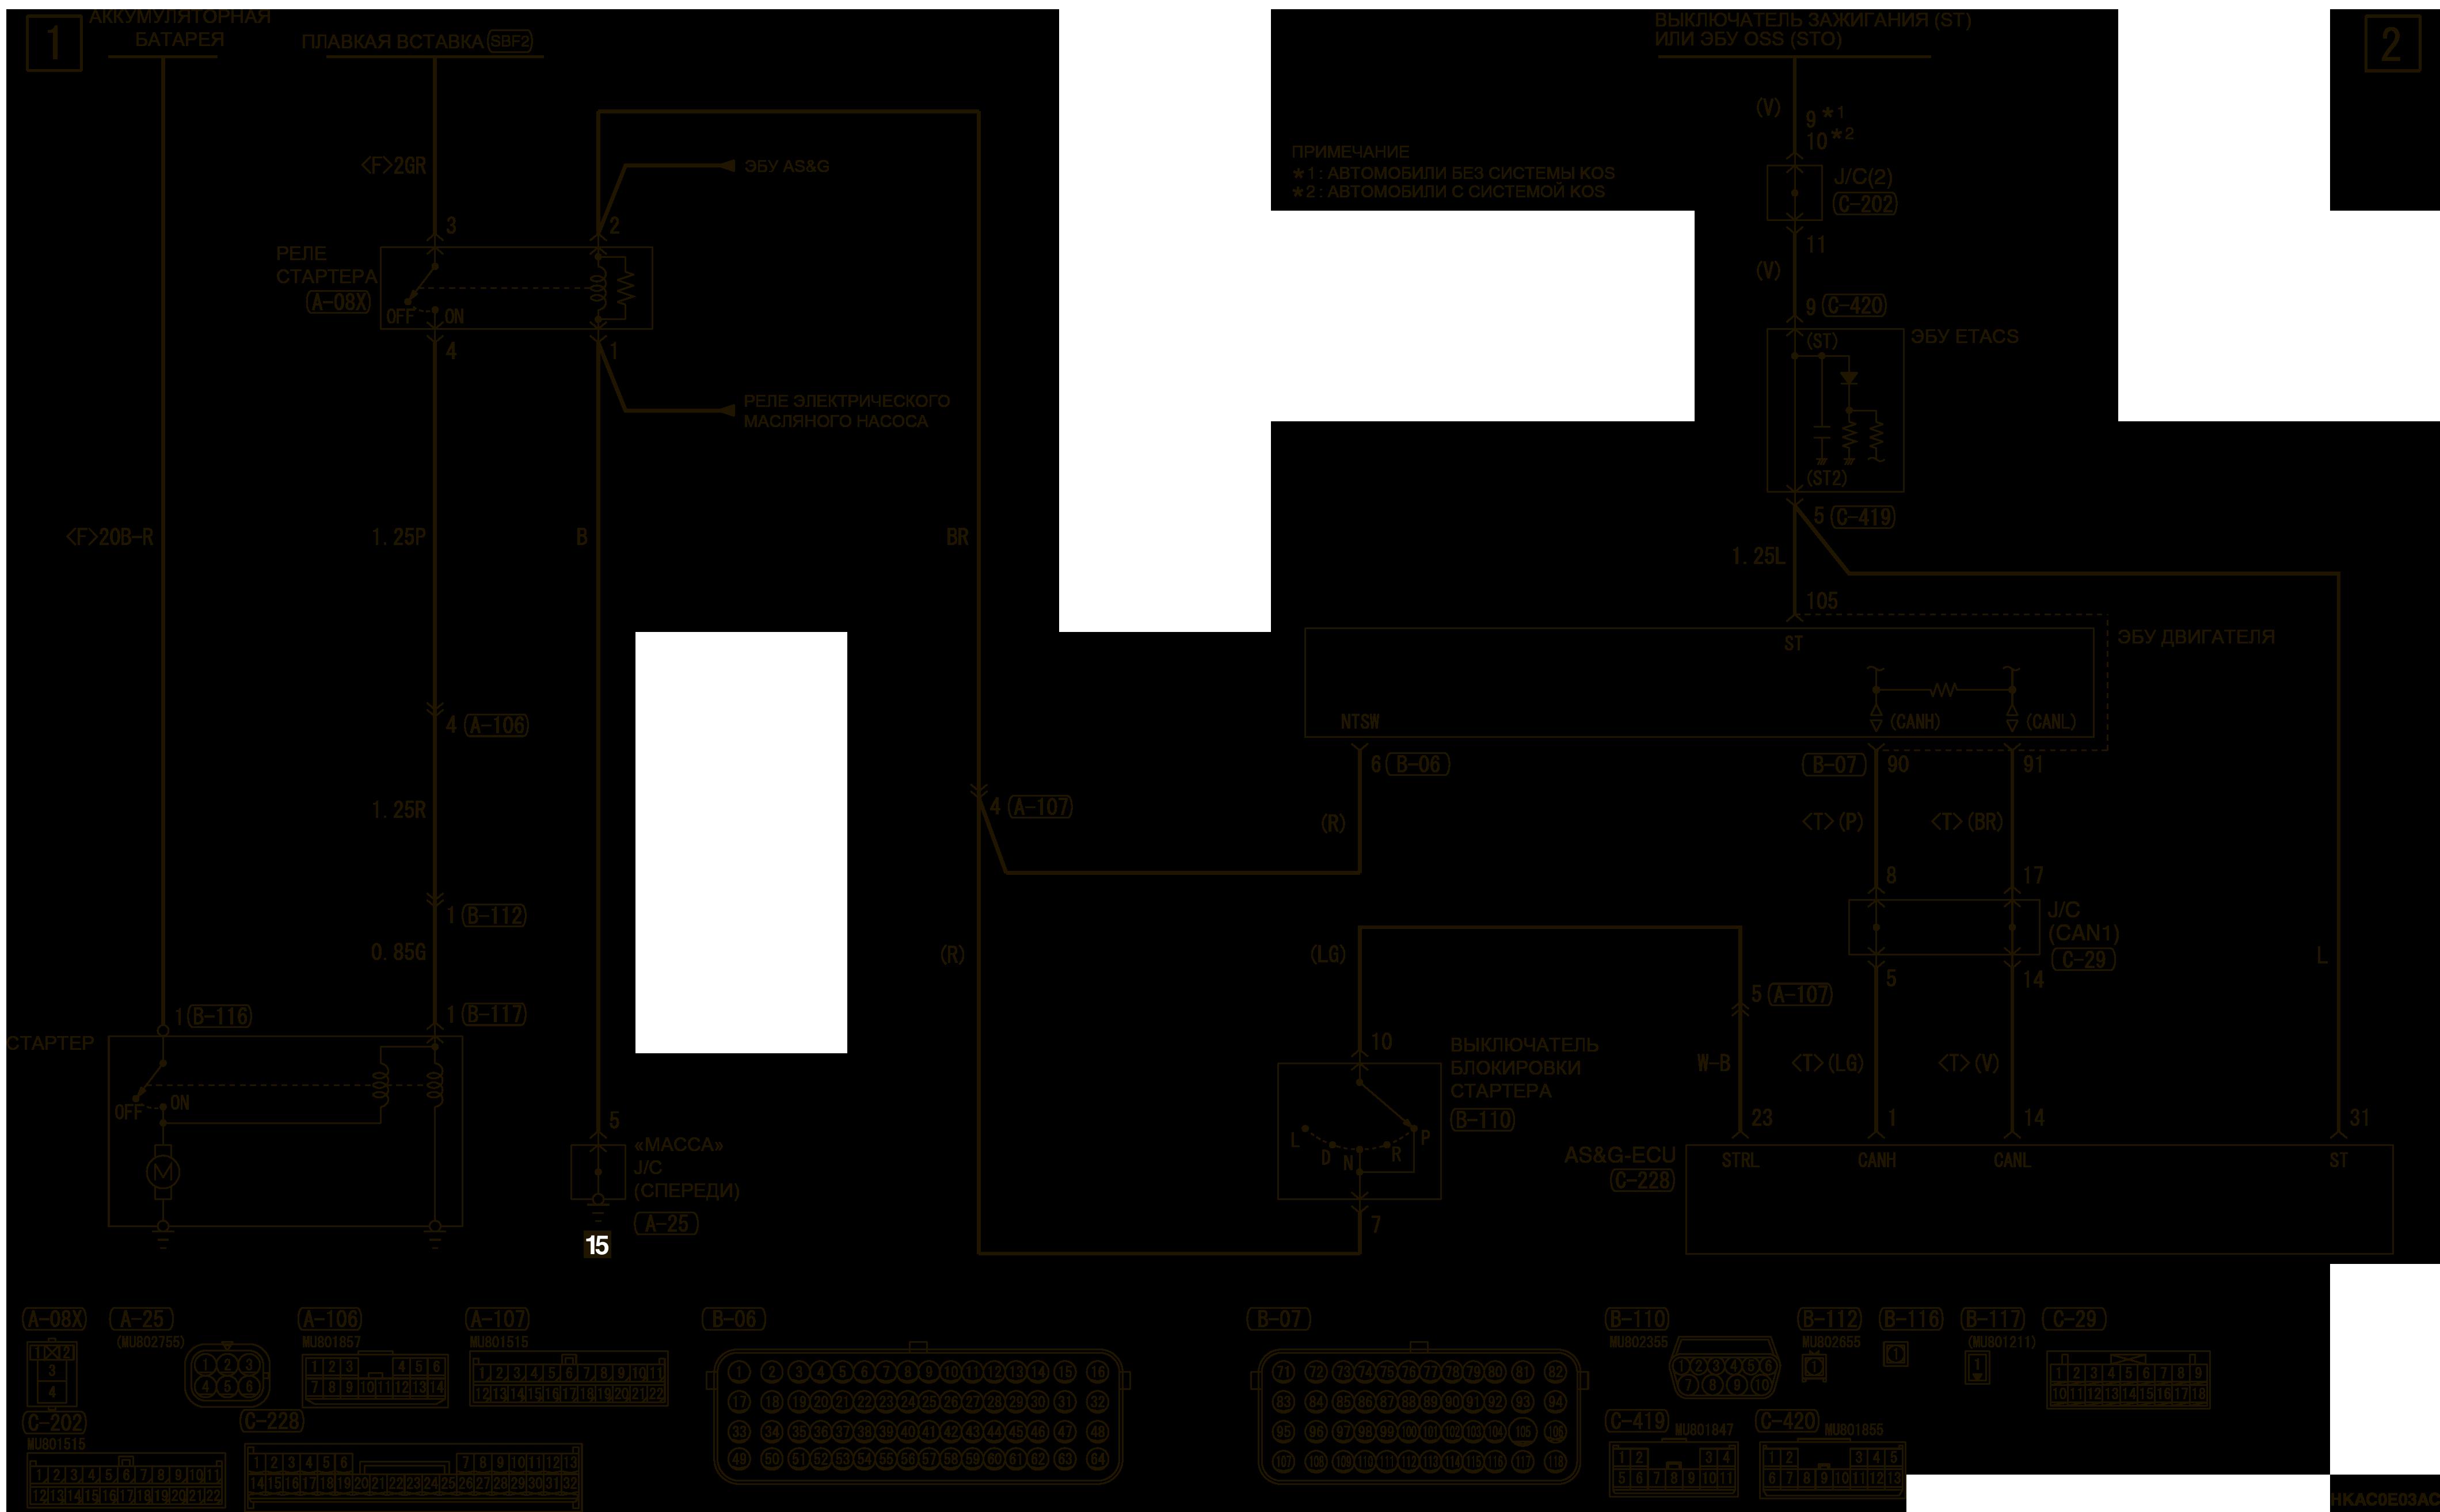 mmc аутлендер 3 2019 электросхемаСИСТЕМА ЭЛЕКТРОПУСКА 4J1-CVT (АВТОМОБИЛИ С СИСТЕМОЙ AS&G)